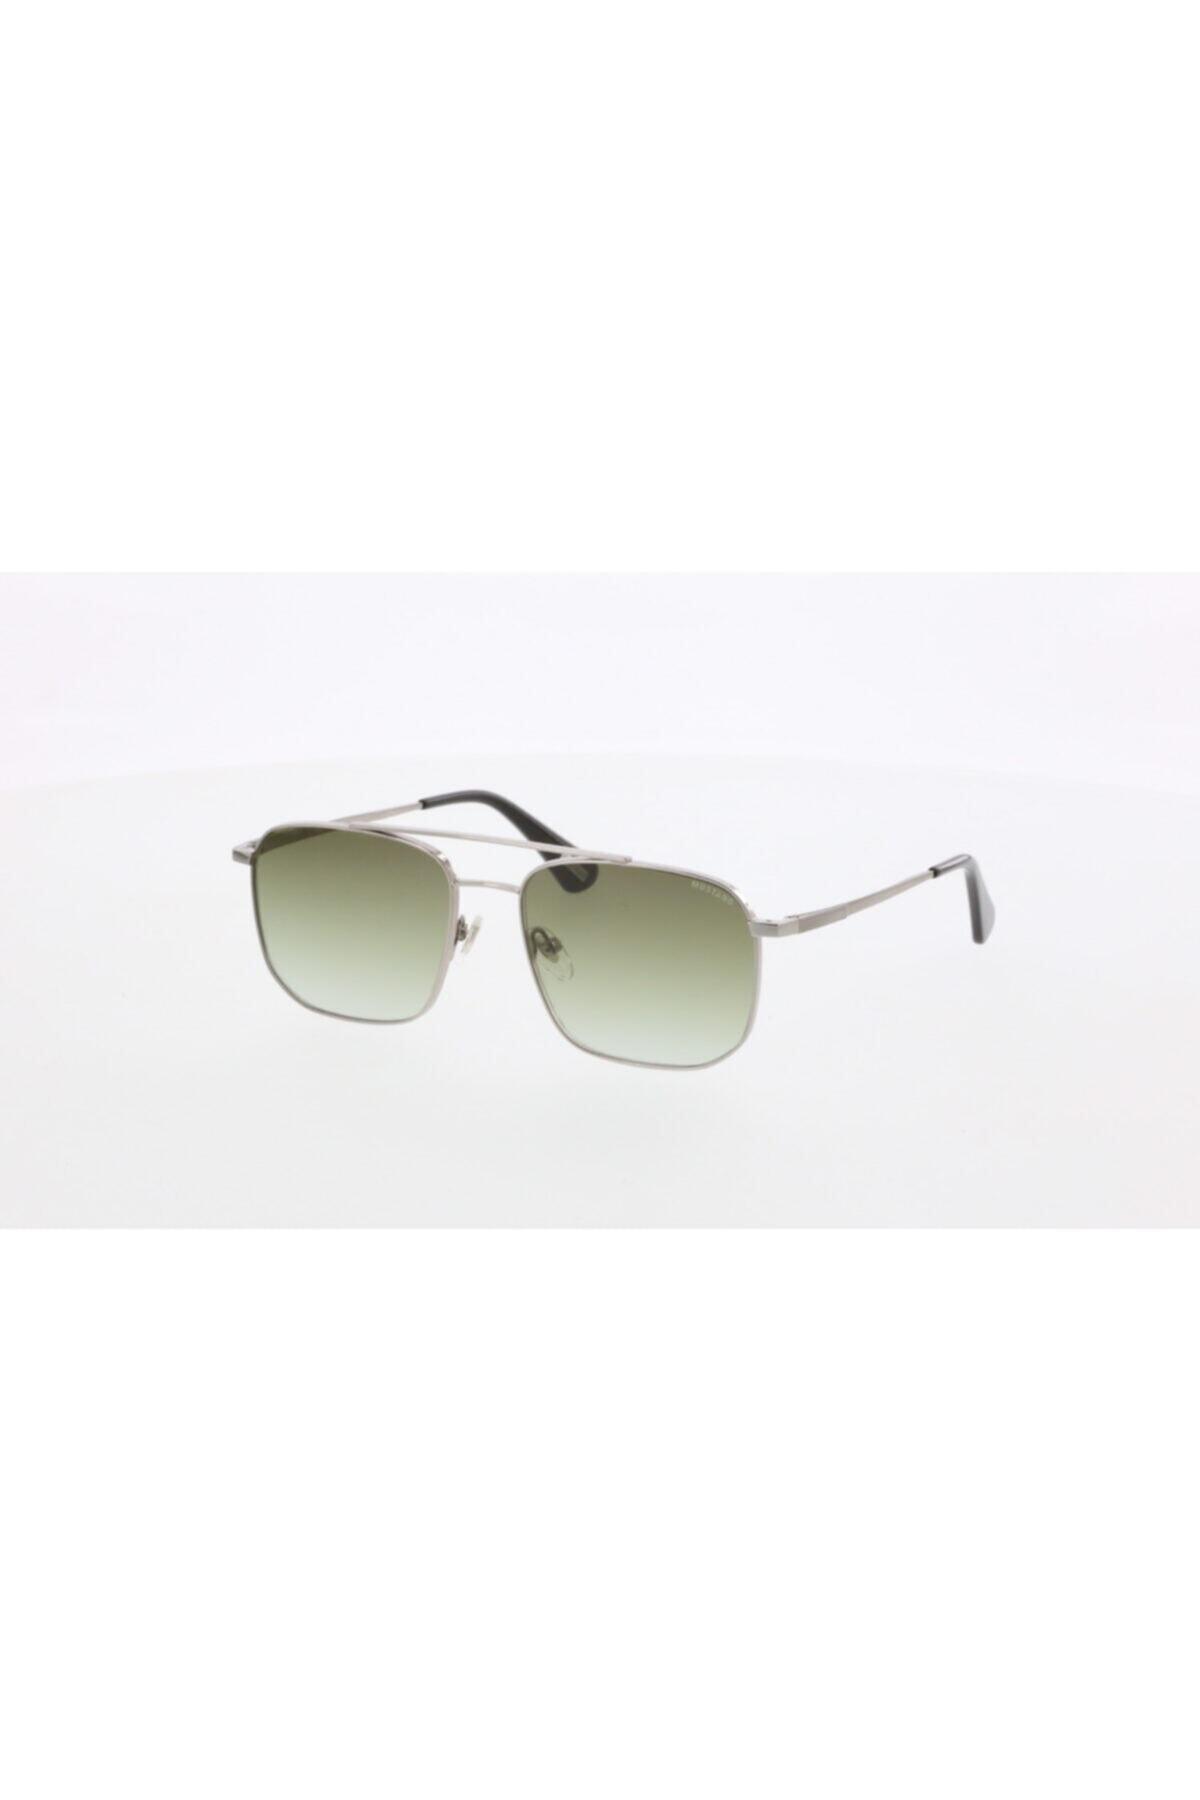 فروش عینک آفتابی اسپرت 2021 برند موستانگ رنگ نقره کد ty97519704